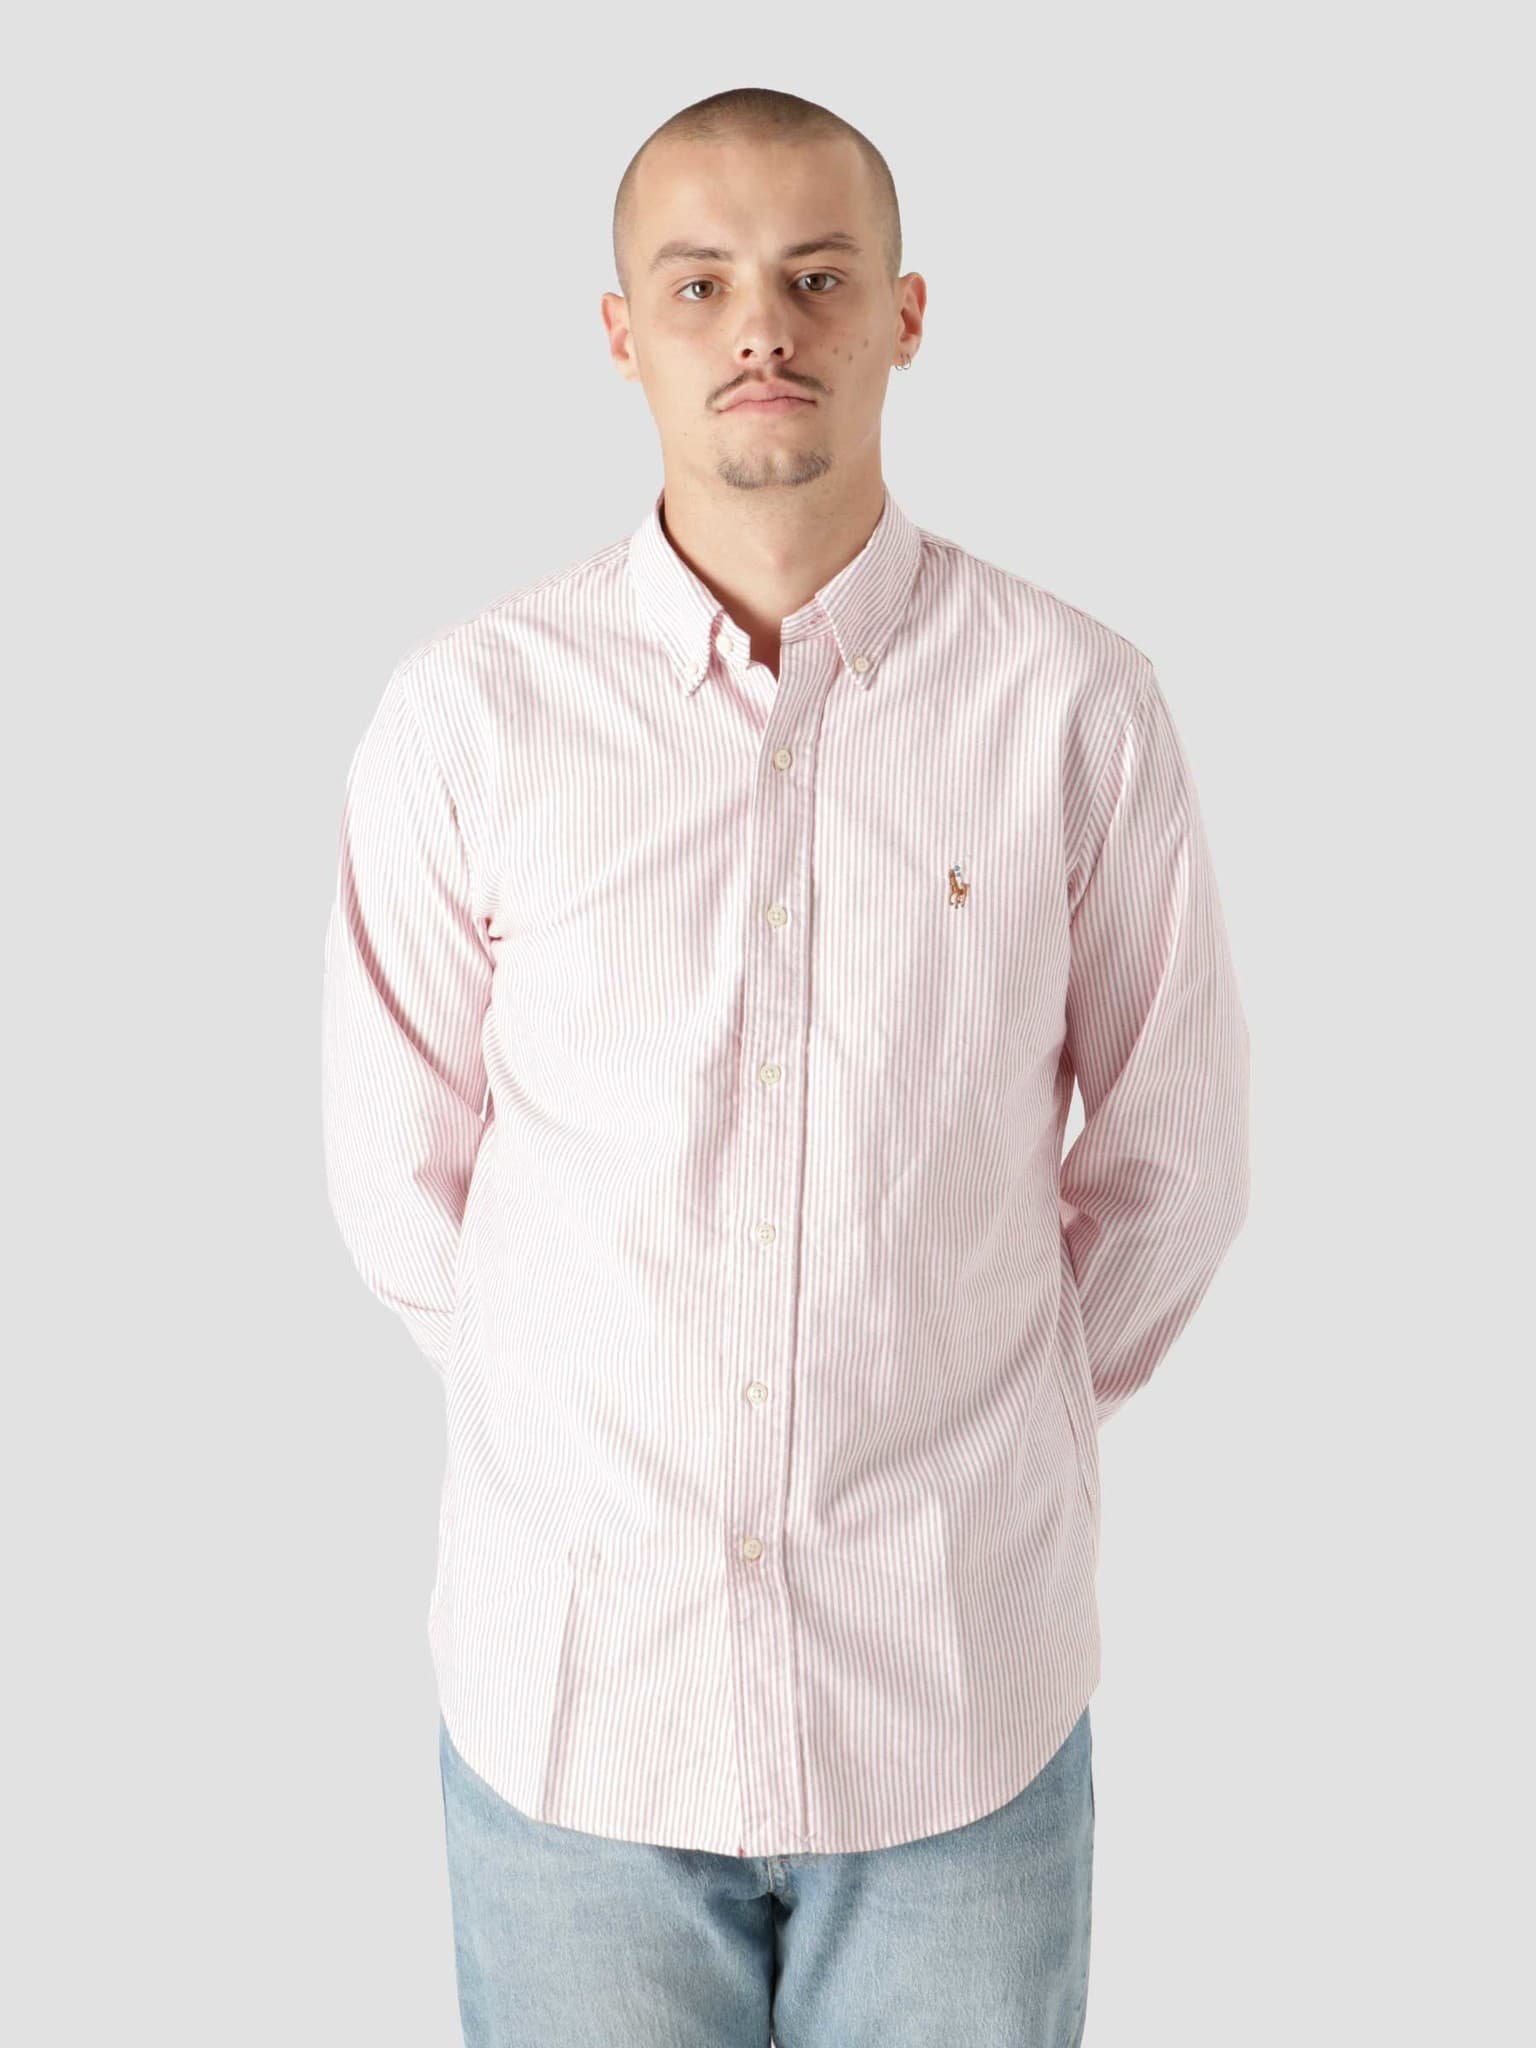 Classic Oxford Shirt 4830B Burgundy White 710853131001